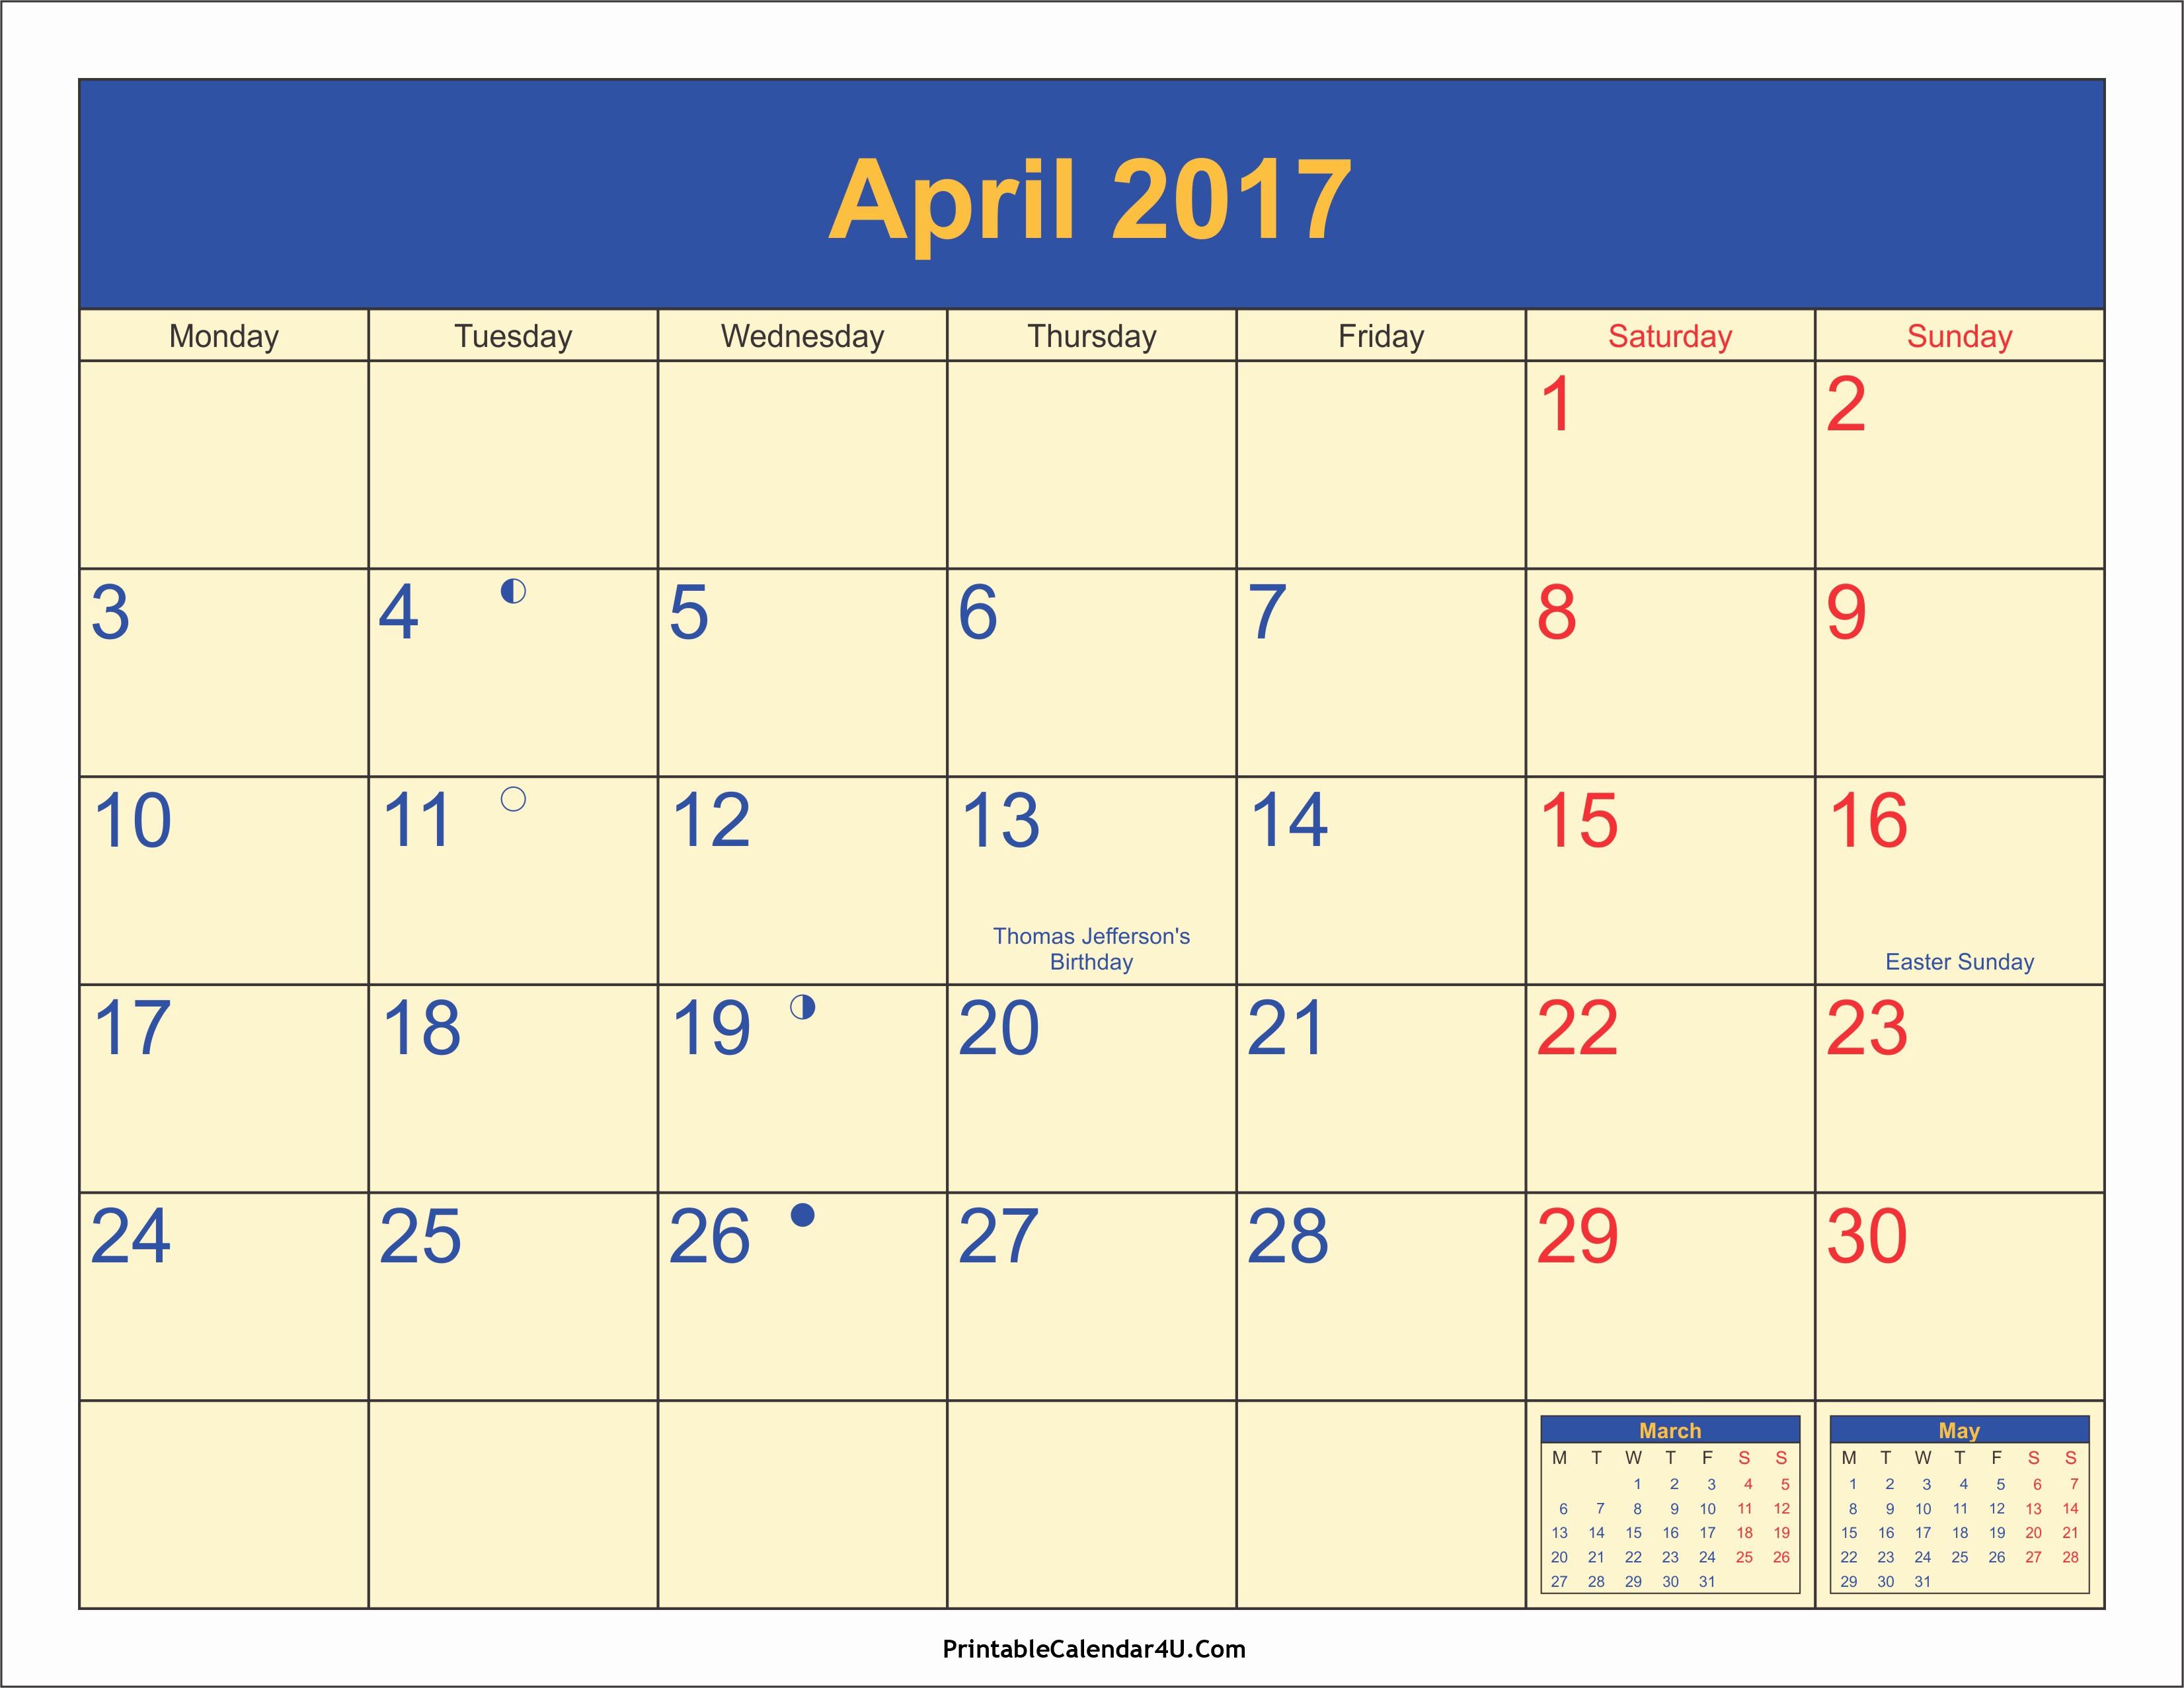 2017 Weekly Calendar with Holidays Beautiful April 2017 Calendar with Holidays